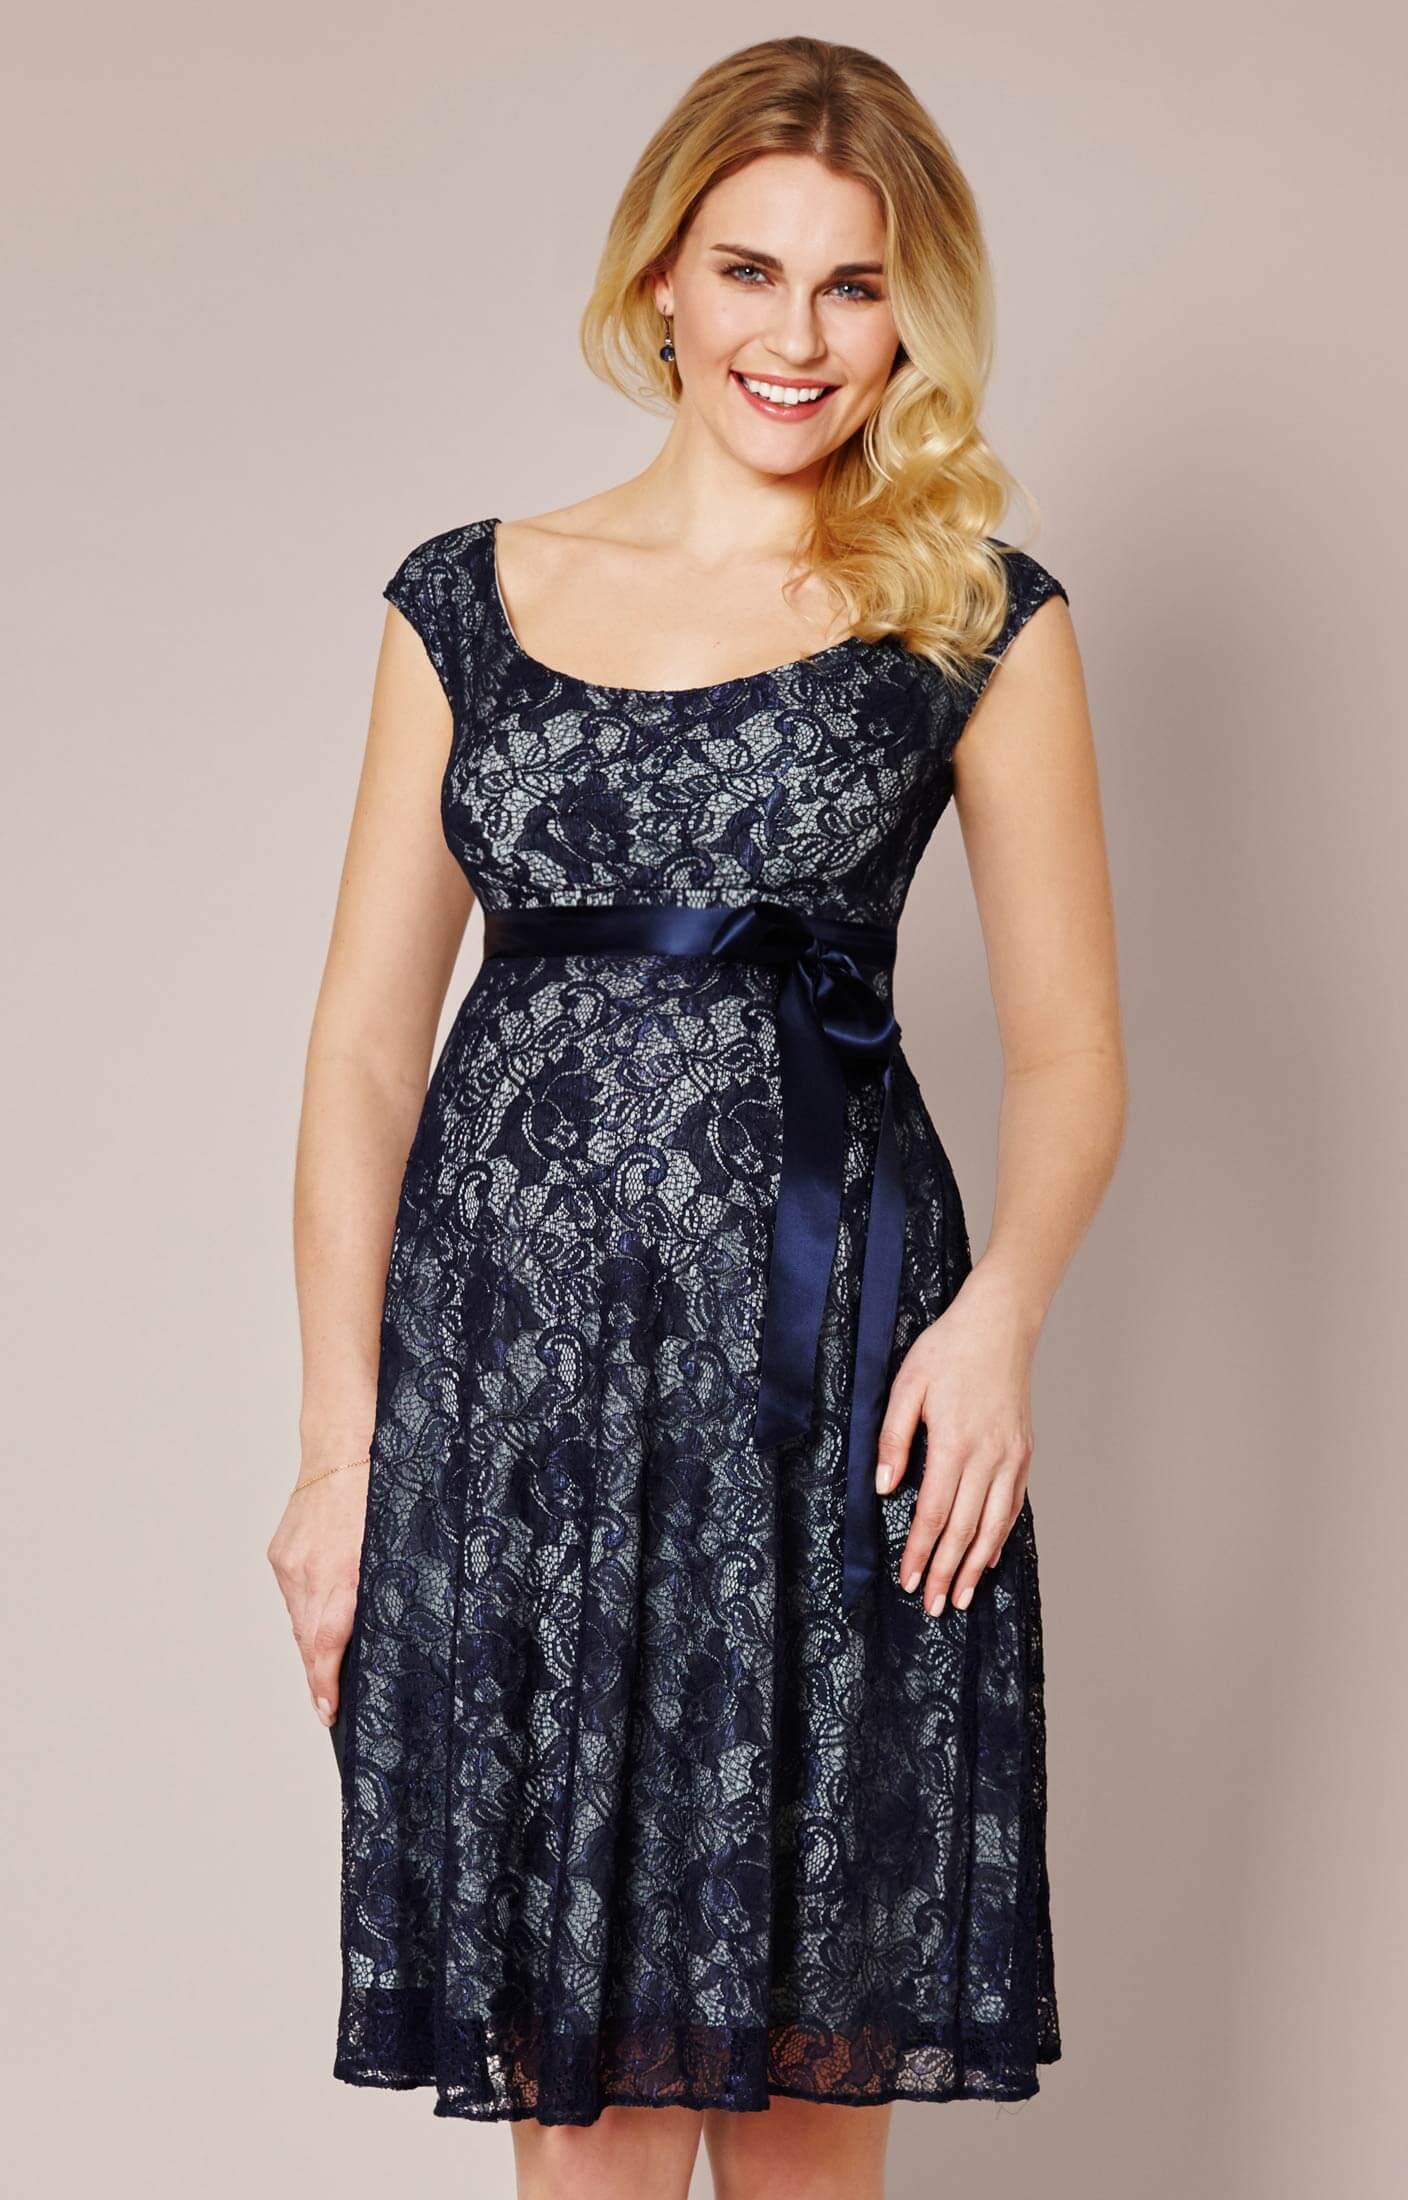 Eliza Maternity Dress Short (Aqua Marine) maternity dresses for weddings Eliza Maternity Dress Short Aqua Marine by Tiffany Rose